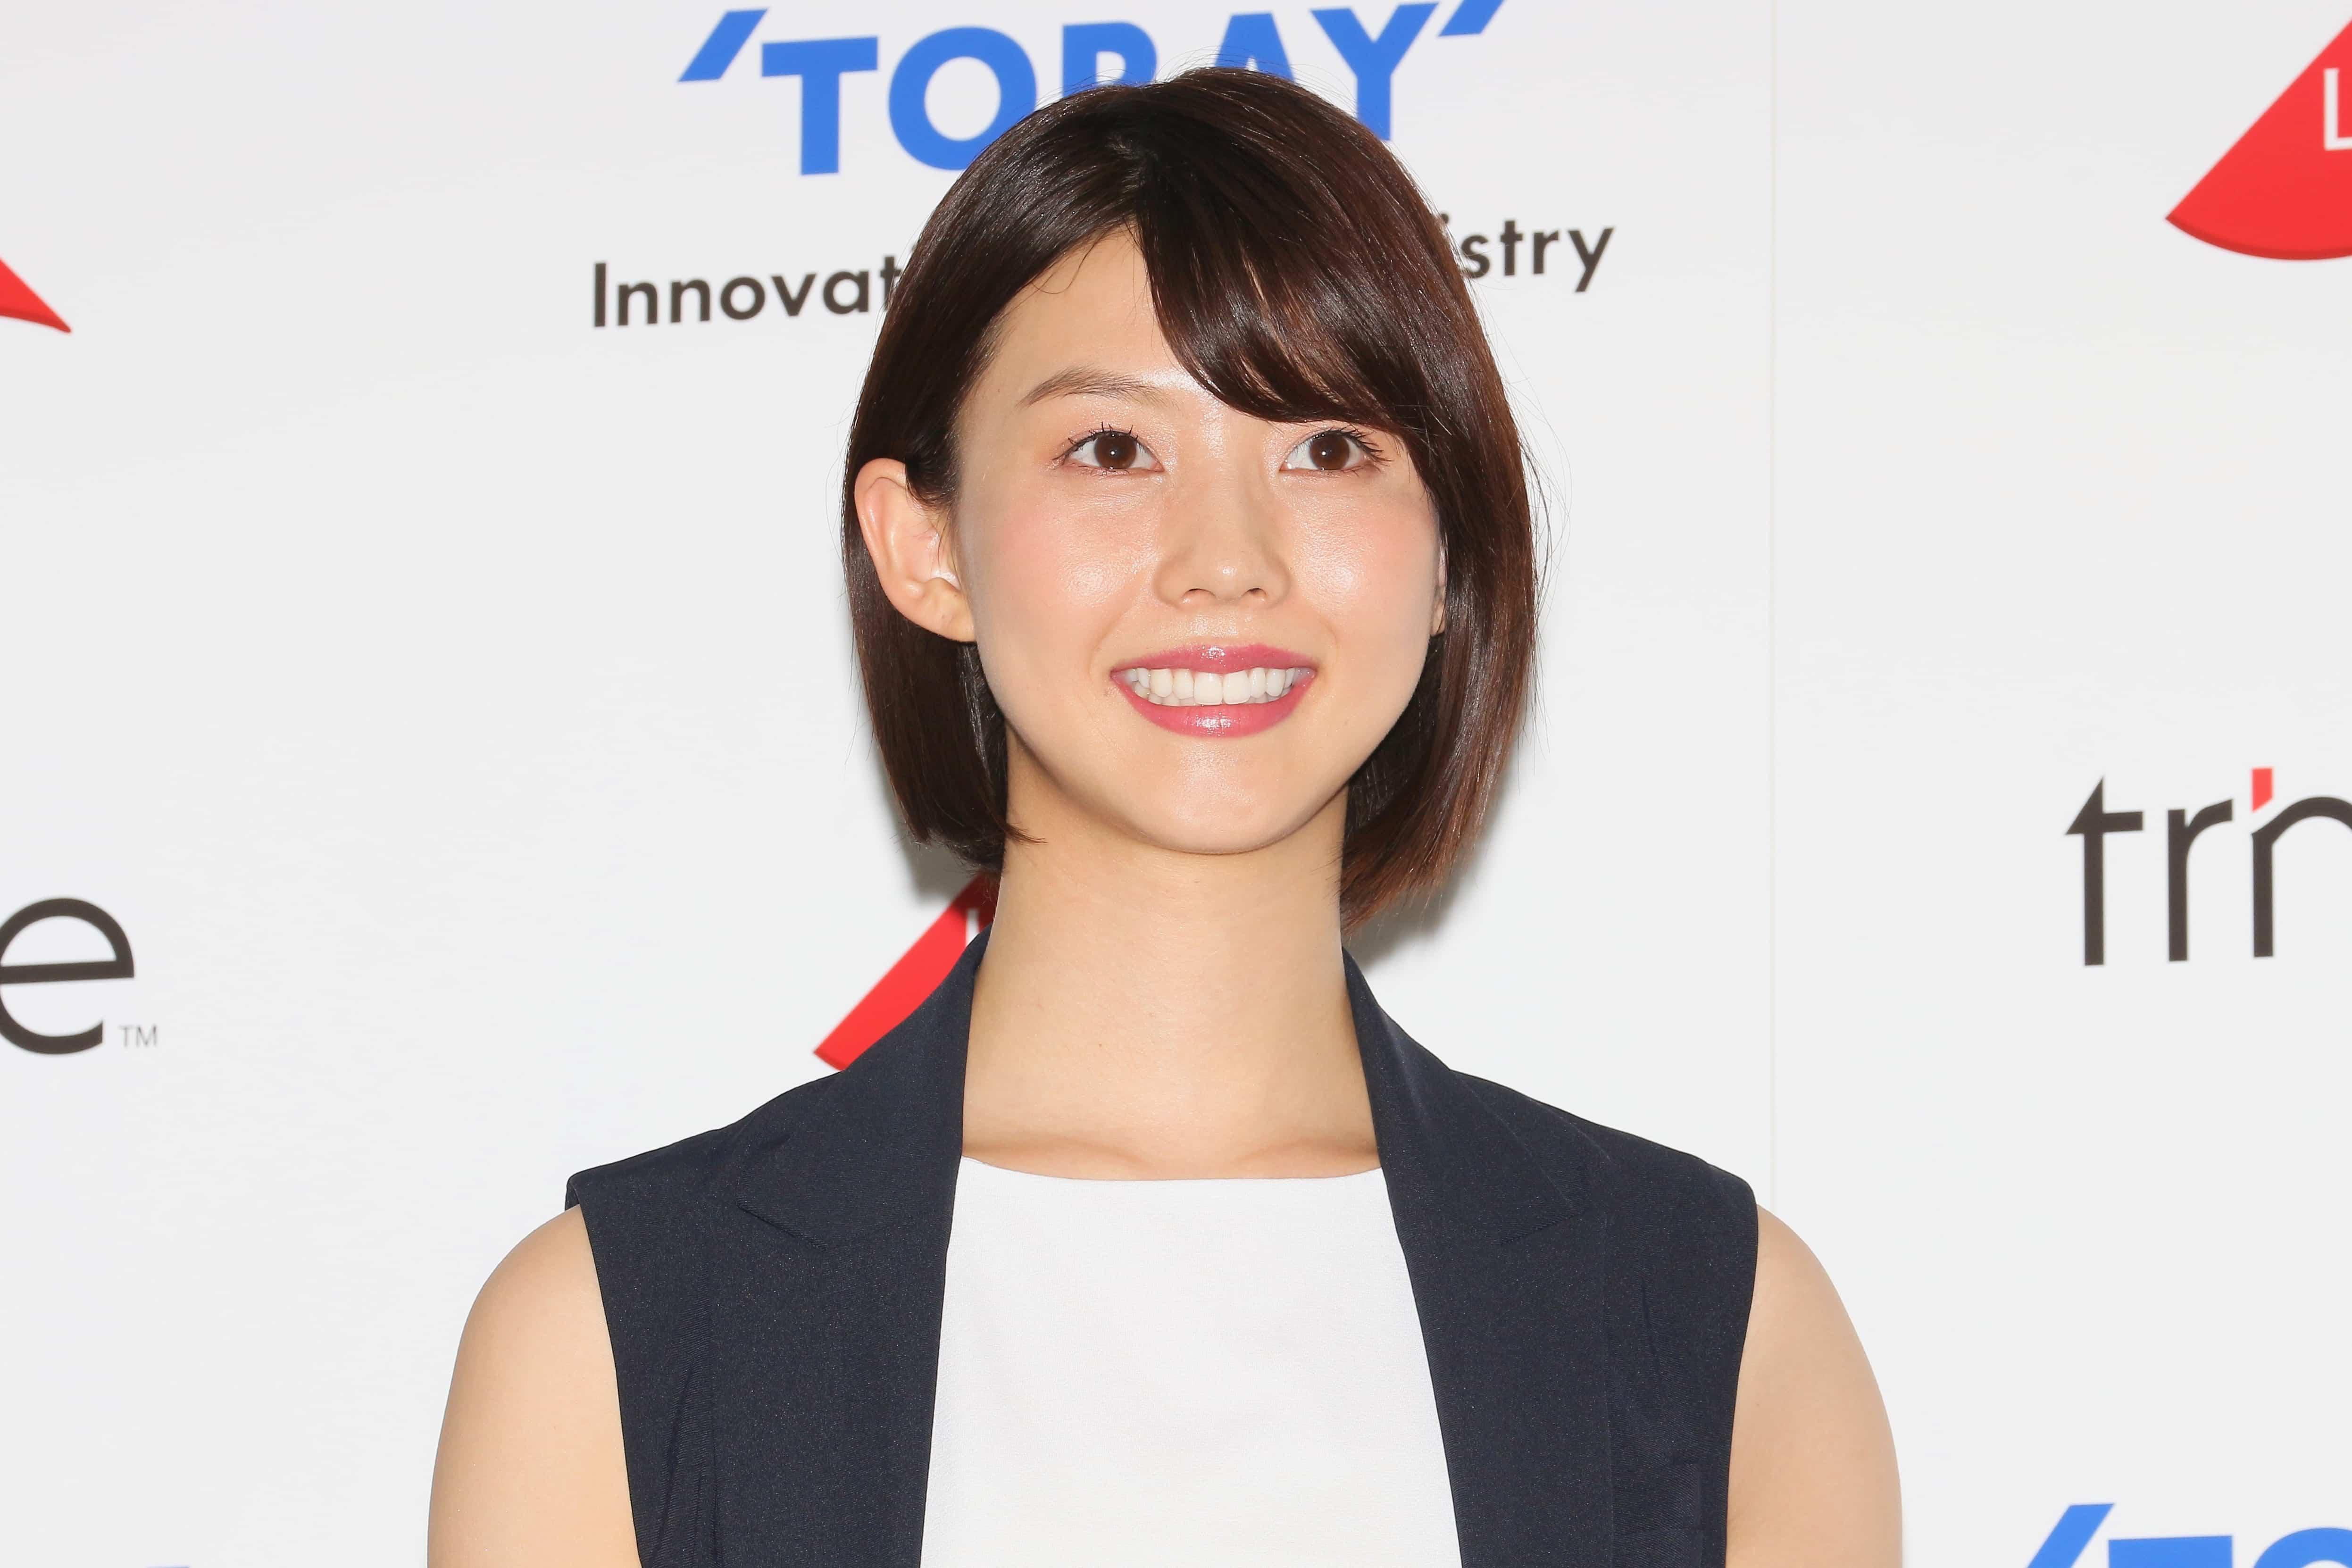 sirabee20181031matsudasawa9 – ニュースサイトしらべぇ